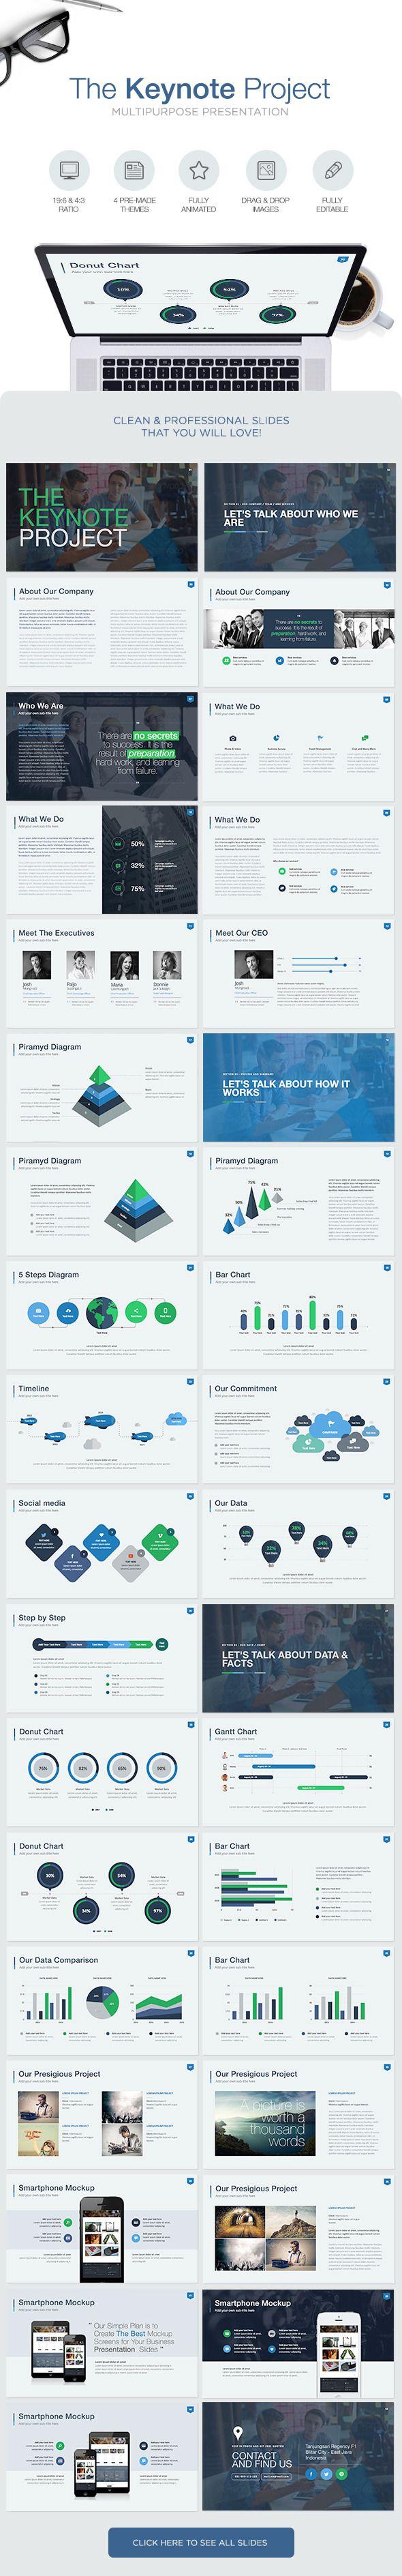 The Keynote Project - Keynote Template - Keynote Templates Presentation Templates